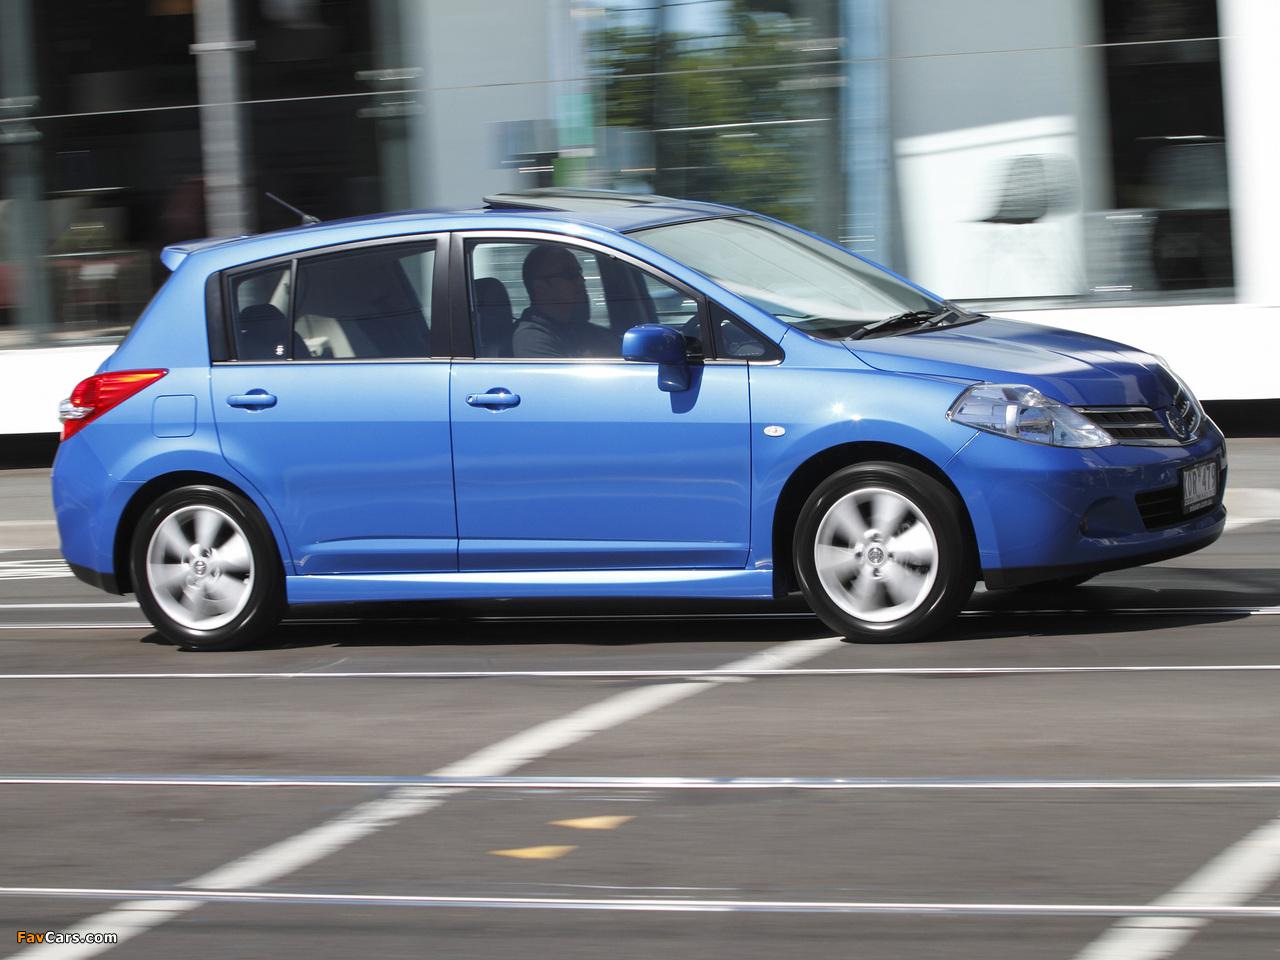 Nissan Tiida Hatchback AU-spec (C11) 2010 wallpapers (1280 x 960)